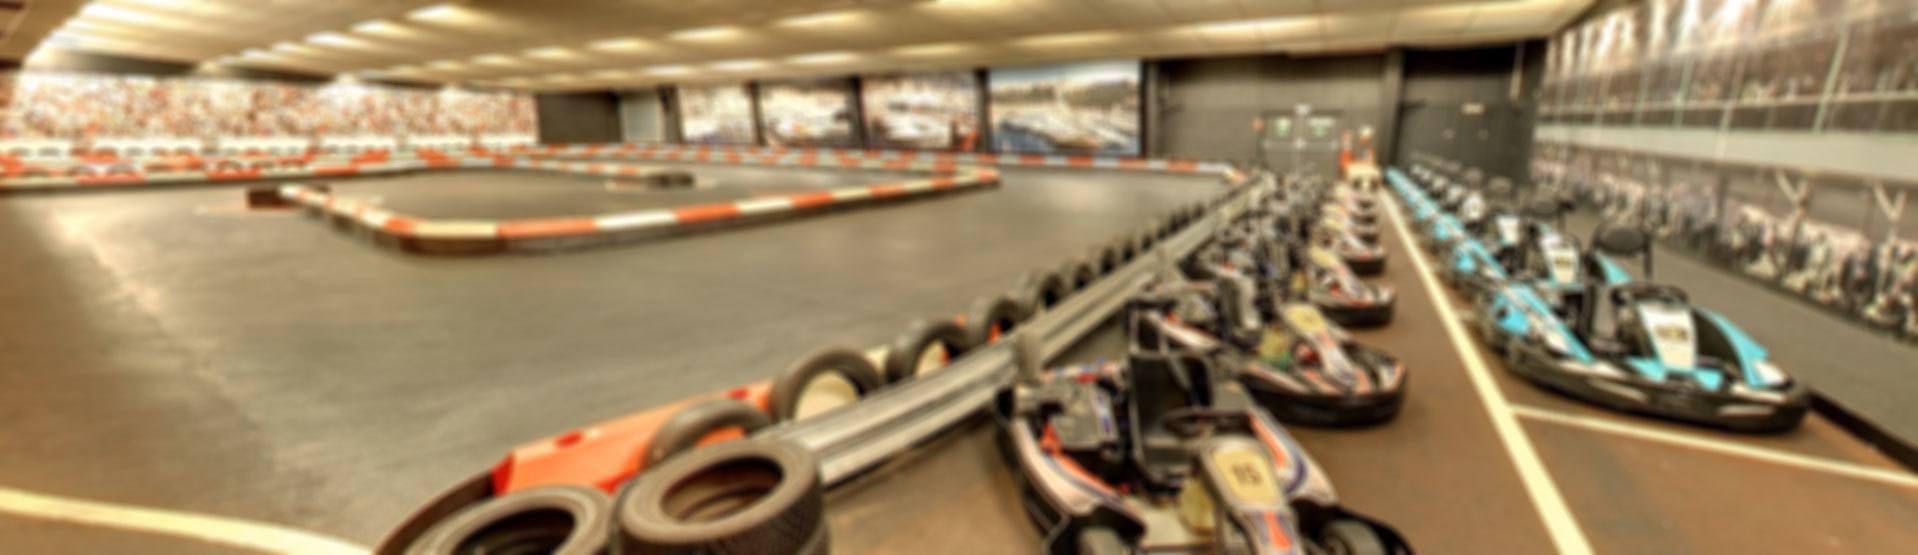 York MotorSports Village - Indoor Karting & Race simulation